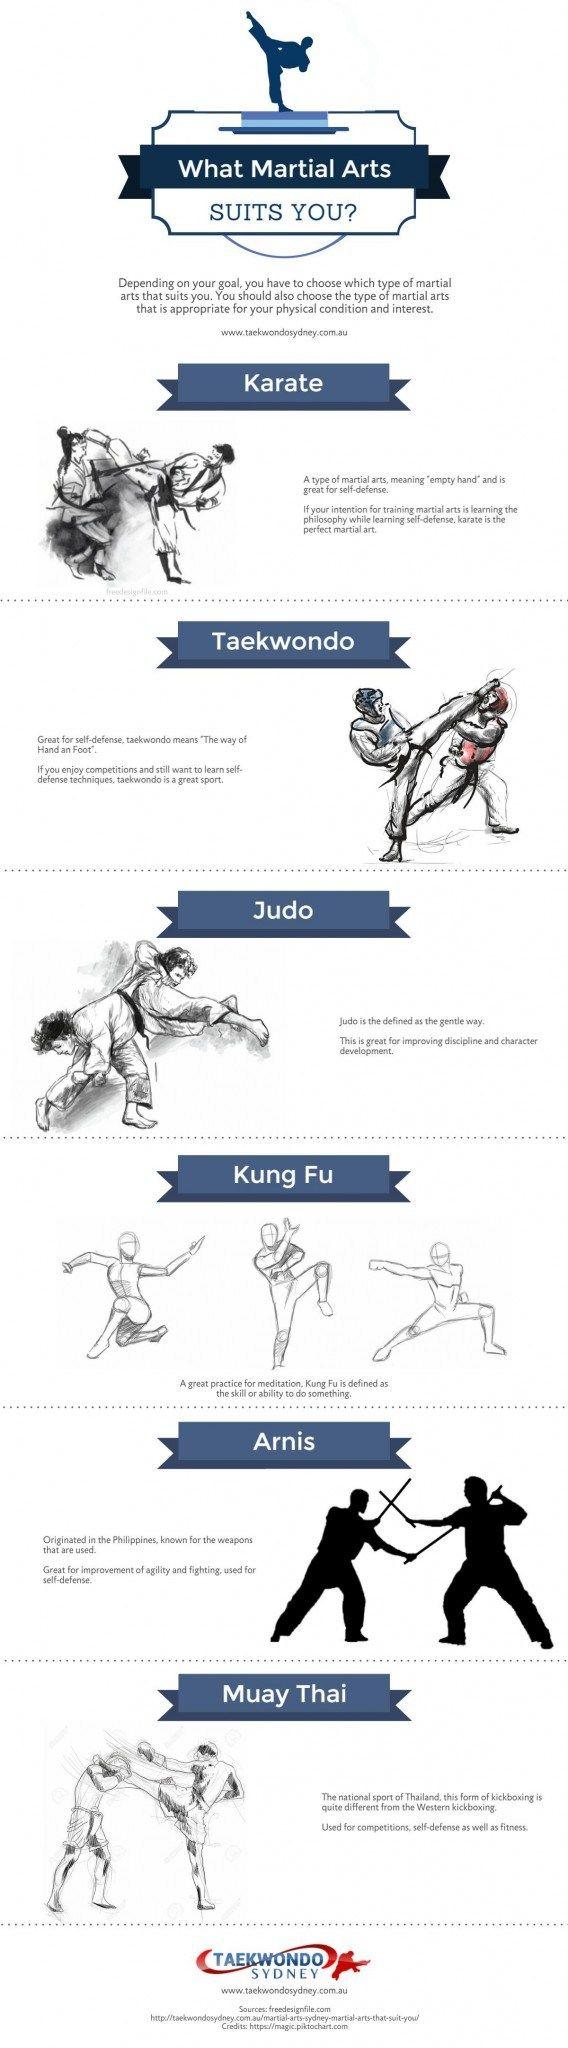 Artele martiale: un trup mai sanatos, o minte agera, incredere in sine si disciplina